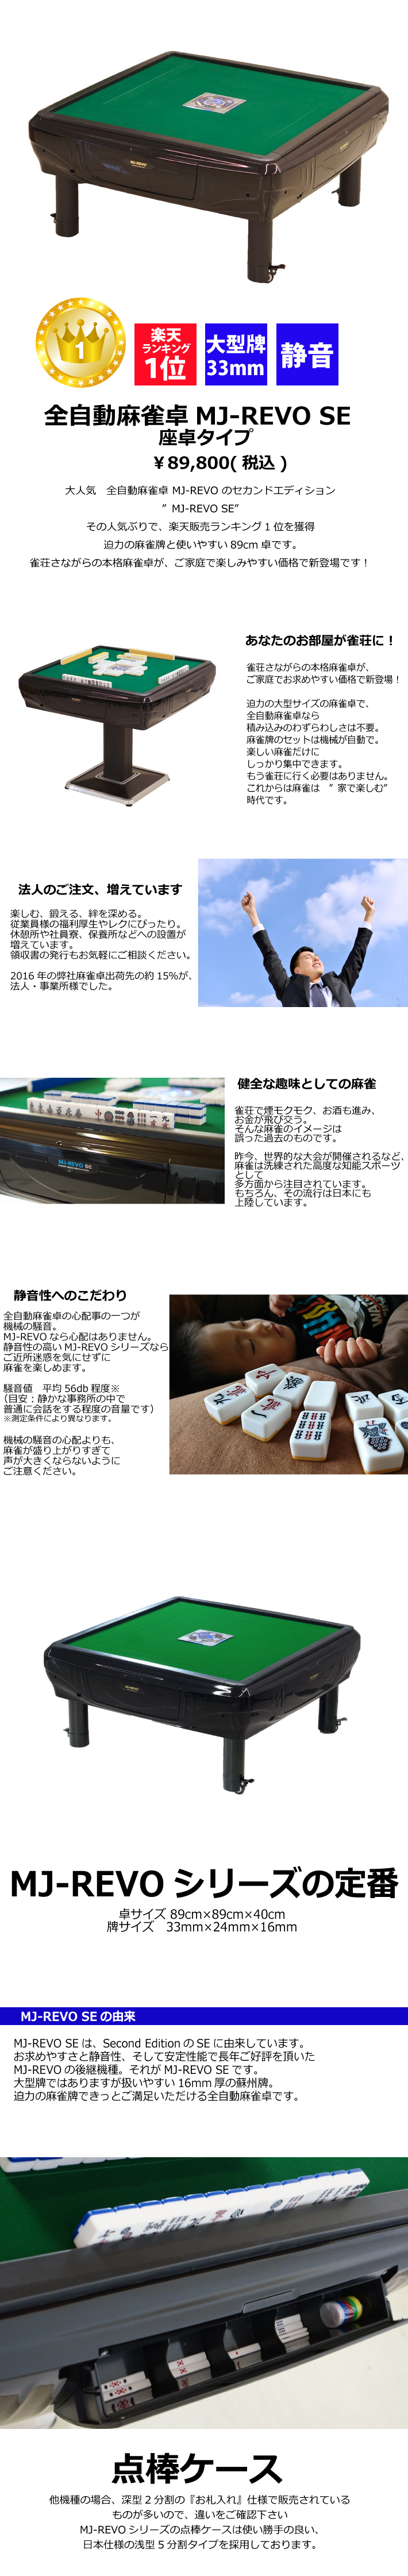 se_zataku_picturepage1.jpg